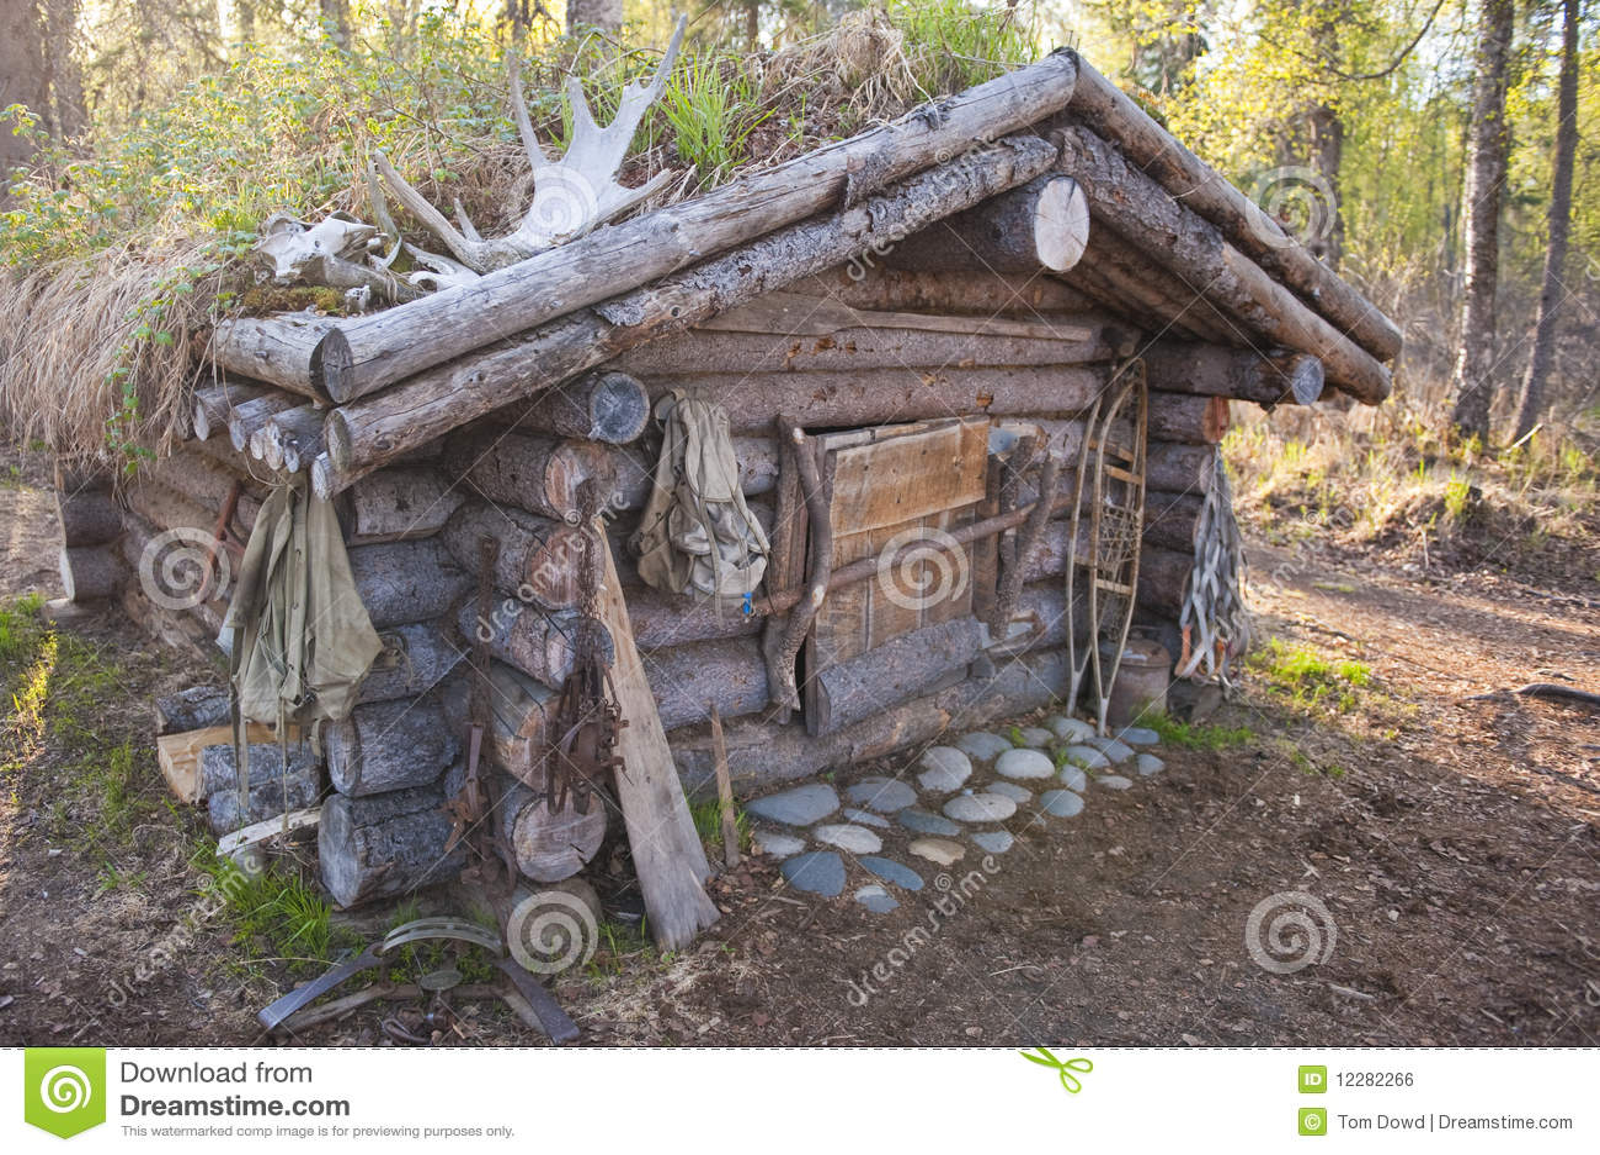 http://thumbs.dreamstime.com/z/hunting-cabin-12282266.jpg